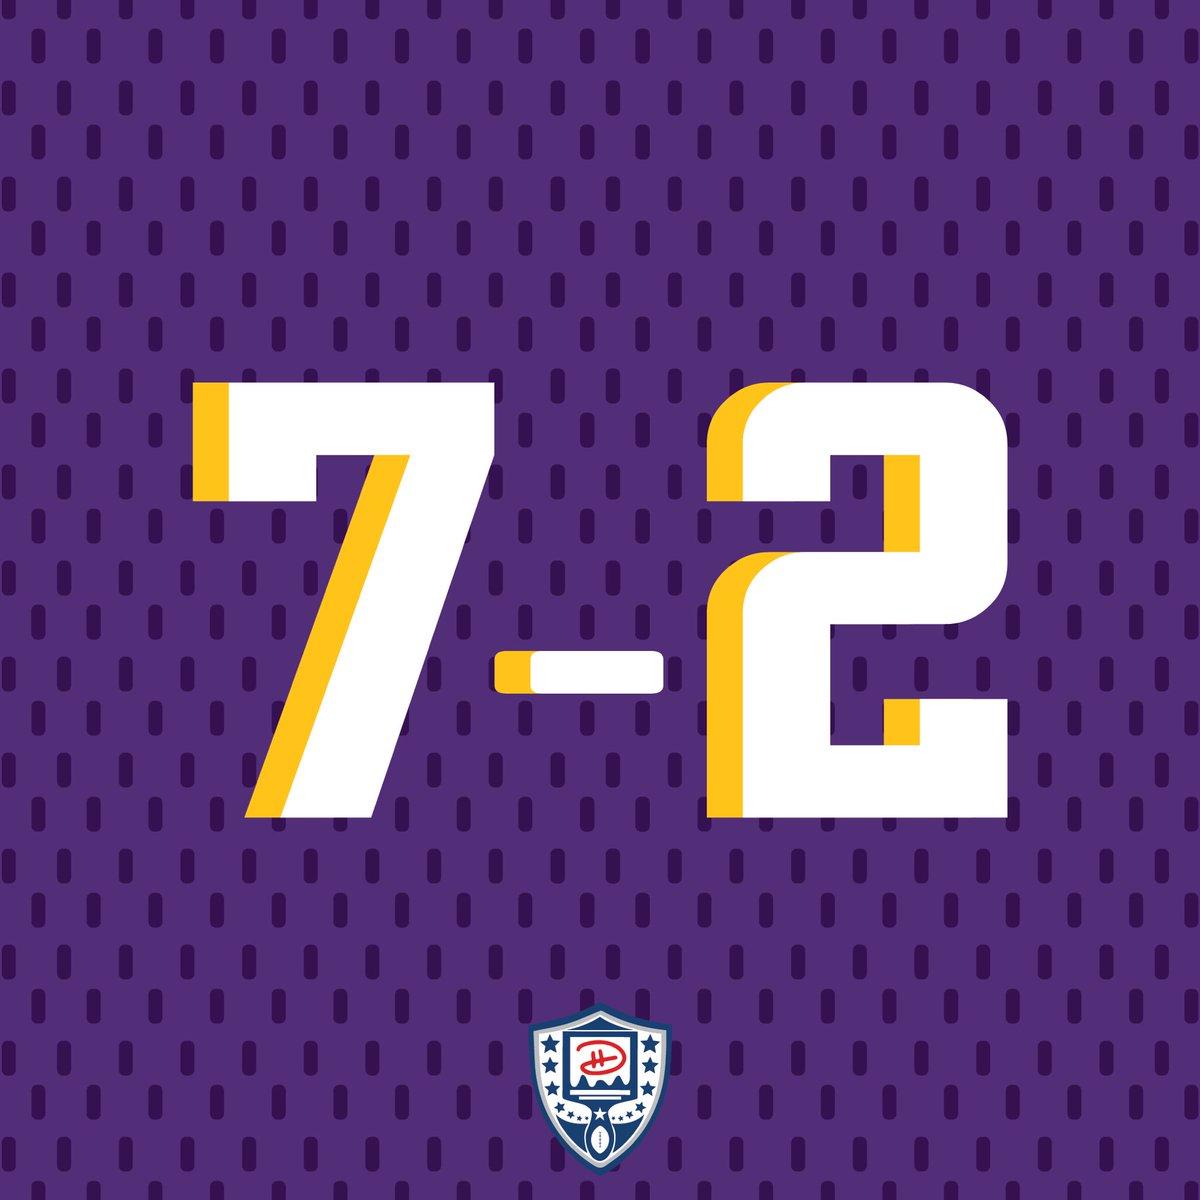 Sooo we're 7-2  #skol  #vikings #nfl #Minnesota #Minneapolis #vikes #favre #diggs #design #score #standings #leaders #nfc #afc #football #monday #sports #playoffs #art #football #typography #allday #teddybridgewater #MillieBobbyBrown #StrangersThings #netflix #eleven #style #fun<br>http://pic.twitter.com/Ew4jn11Yi7